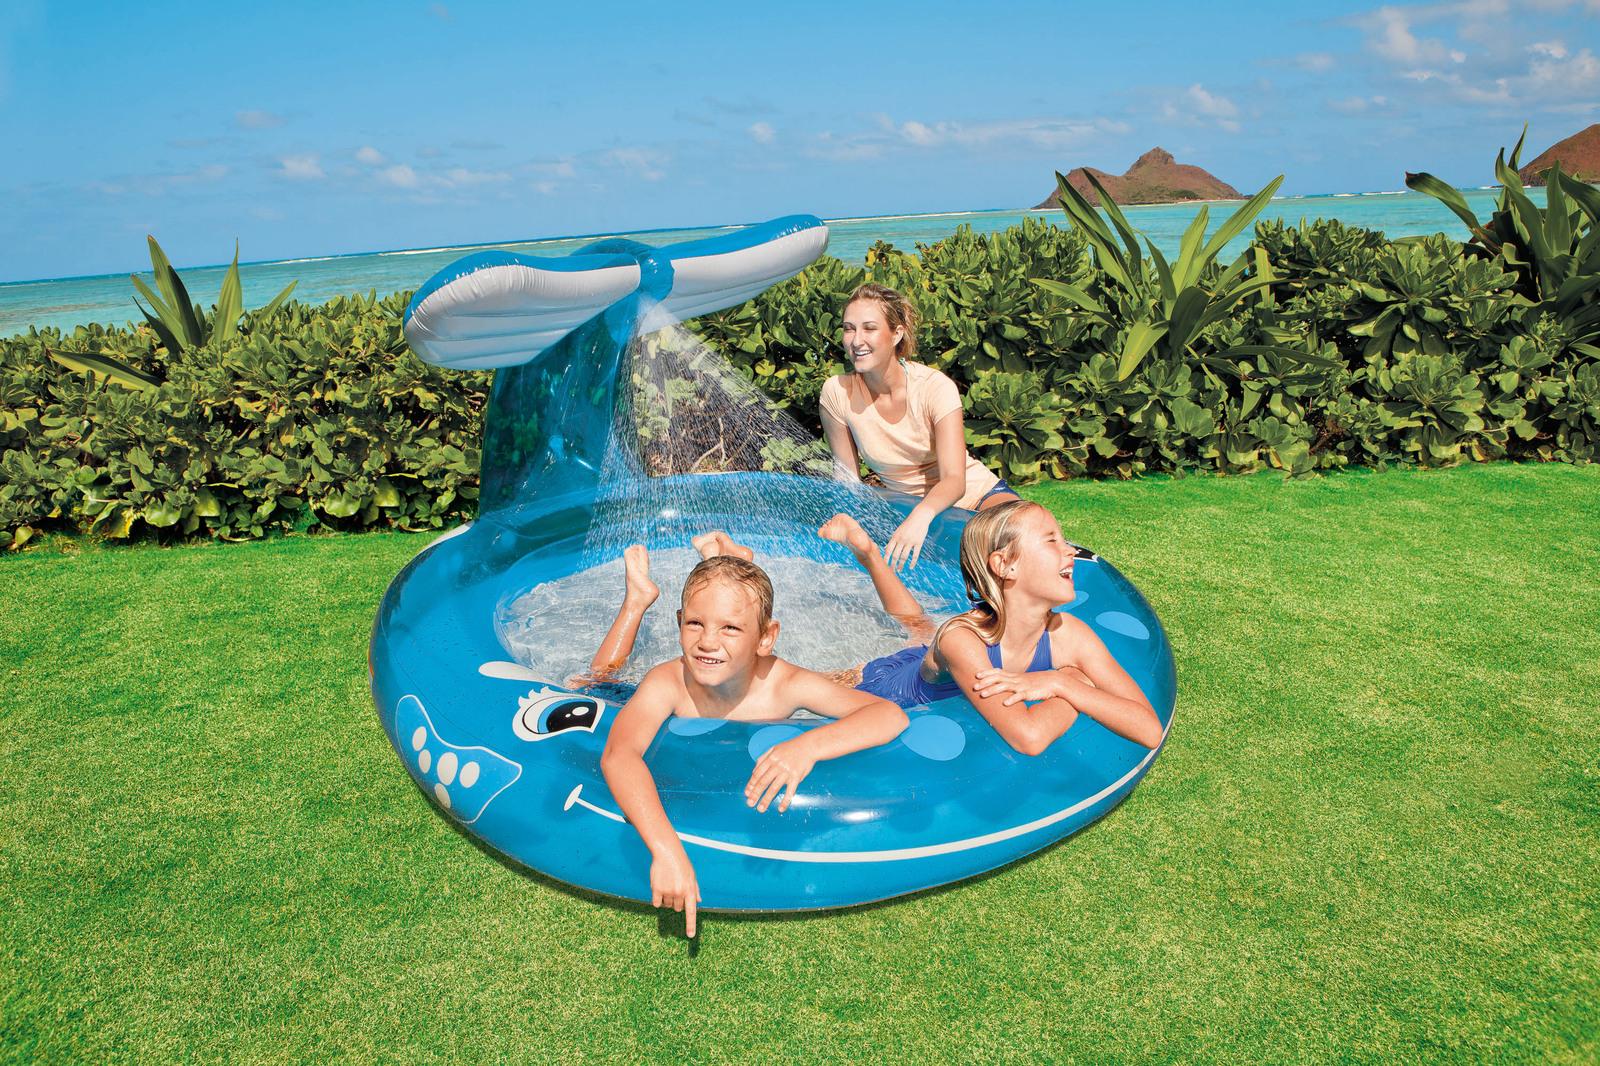 Intex Whale Spray Pool Toy At Mighty Ape Australia